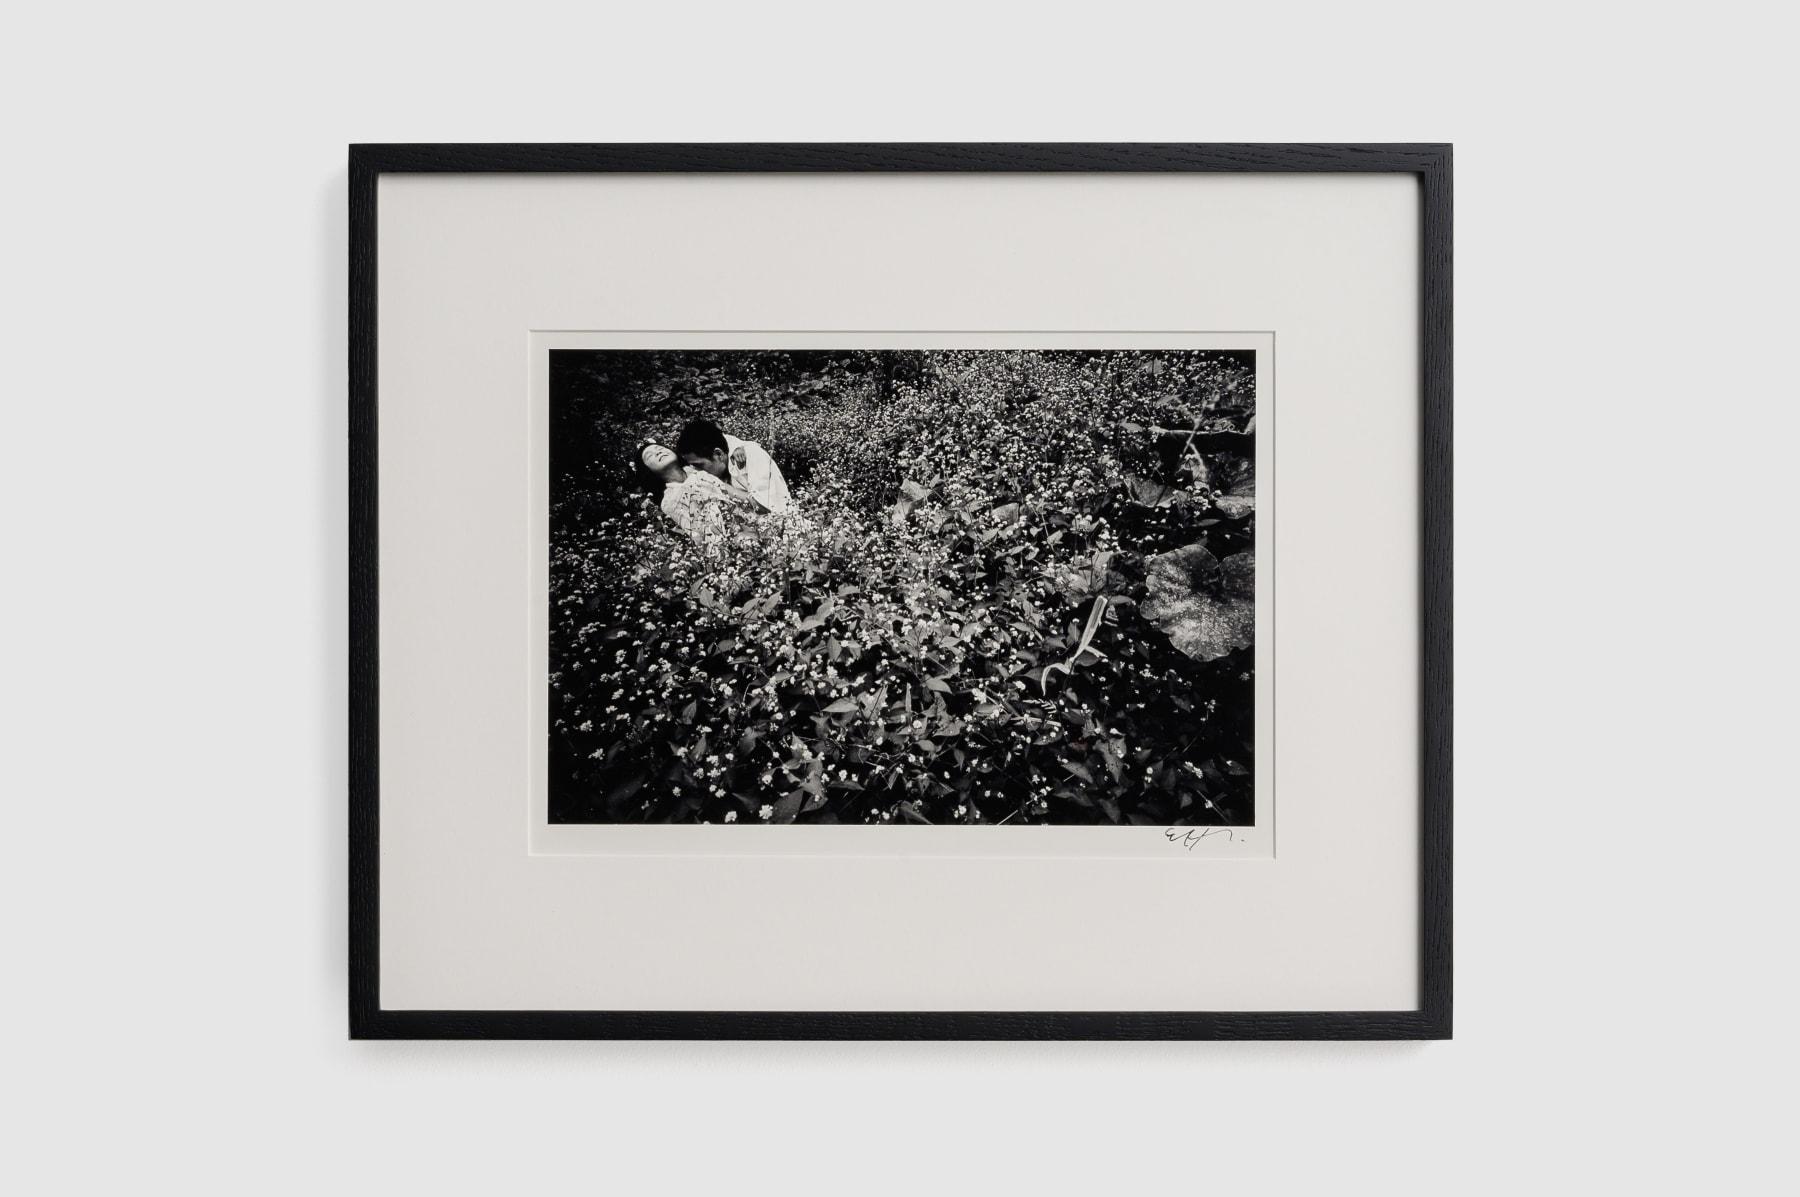 Eikoh Hosoe, Kamaitachi #23 (large), 1965/2014